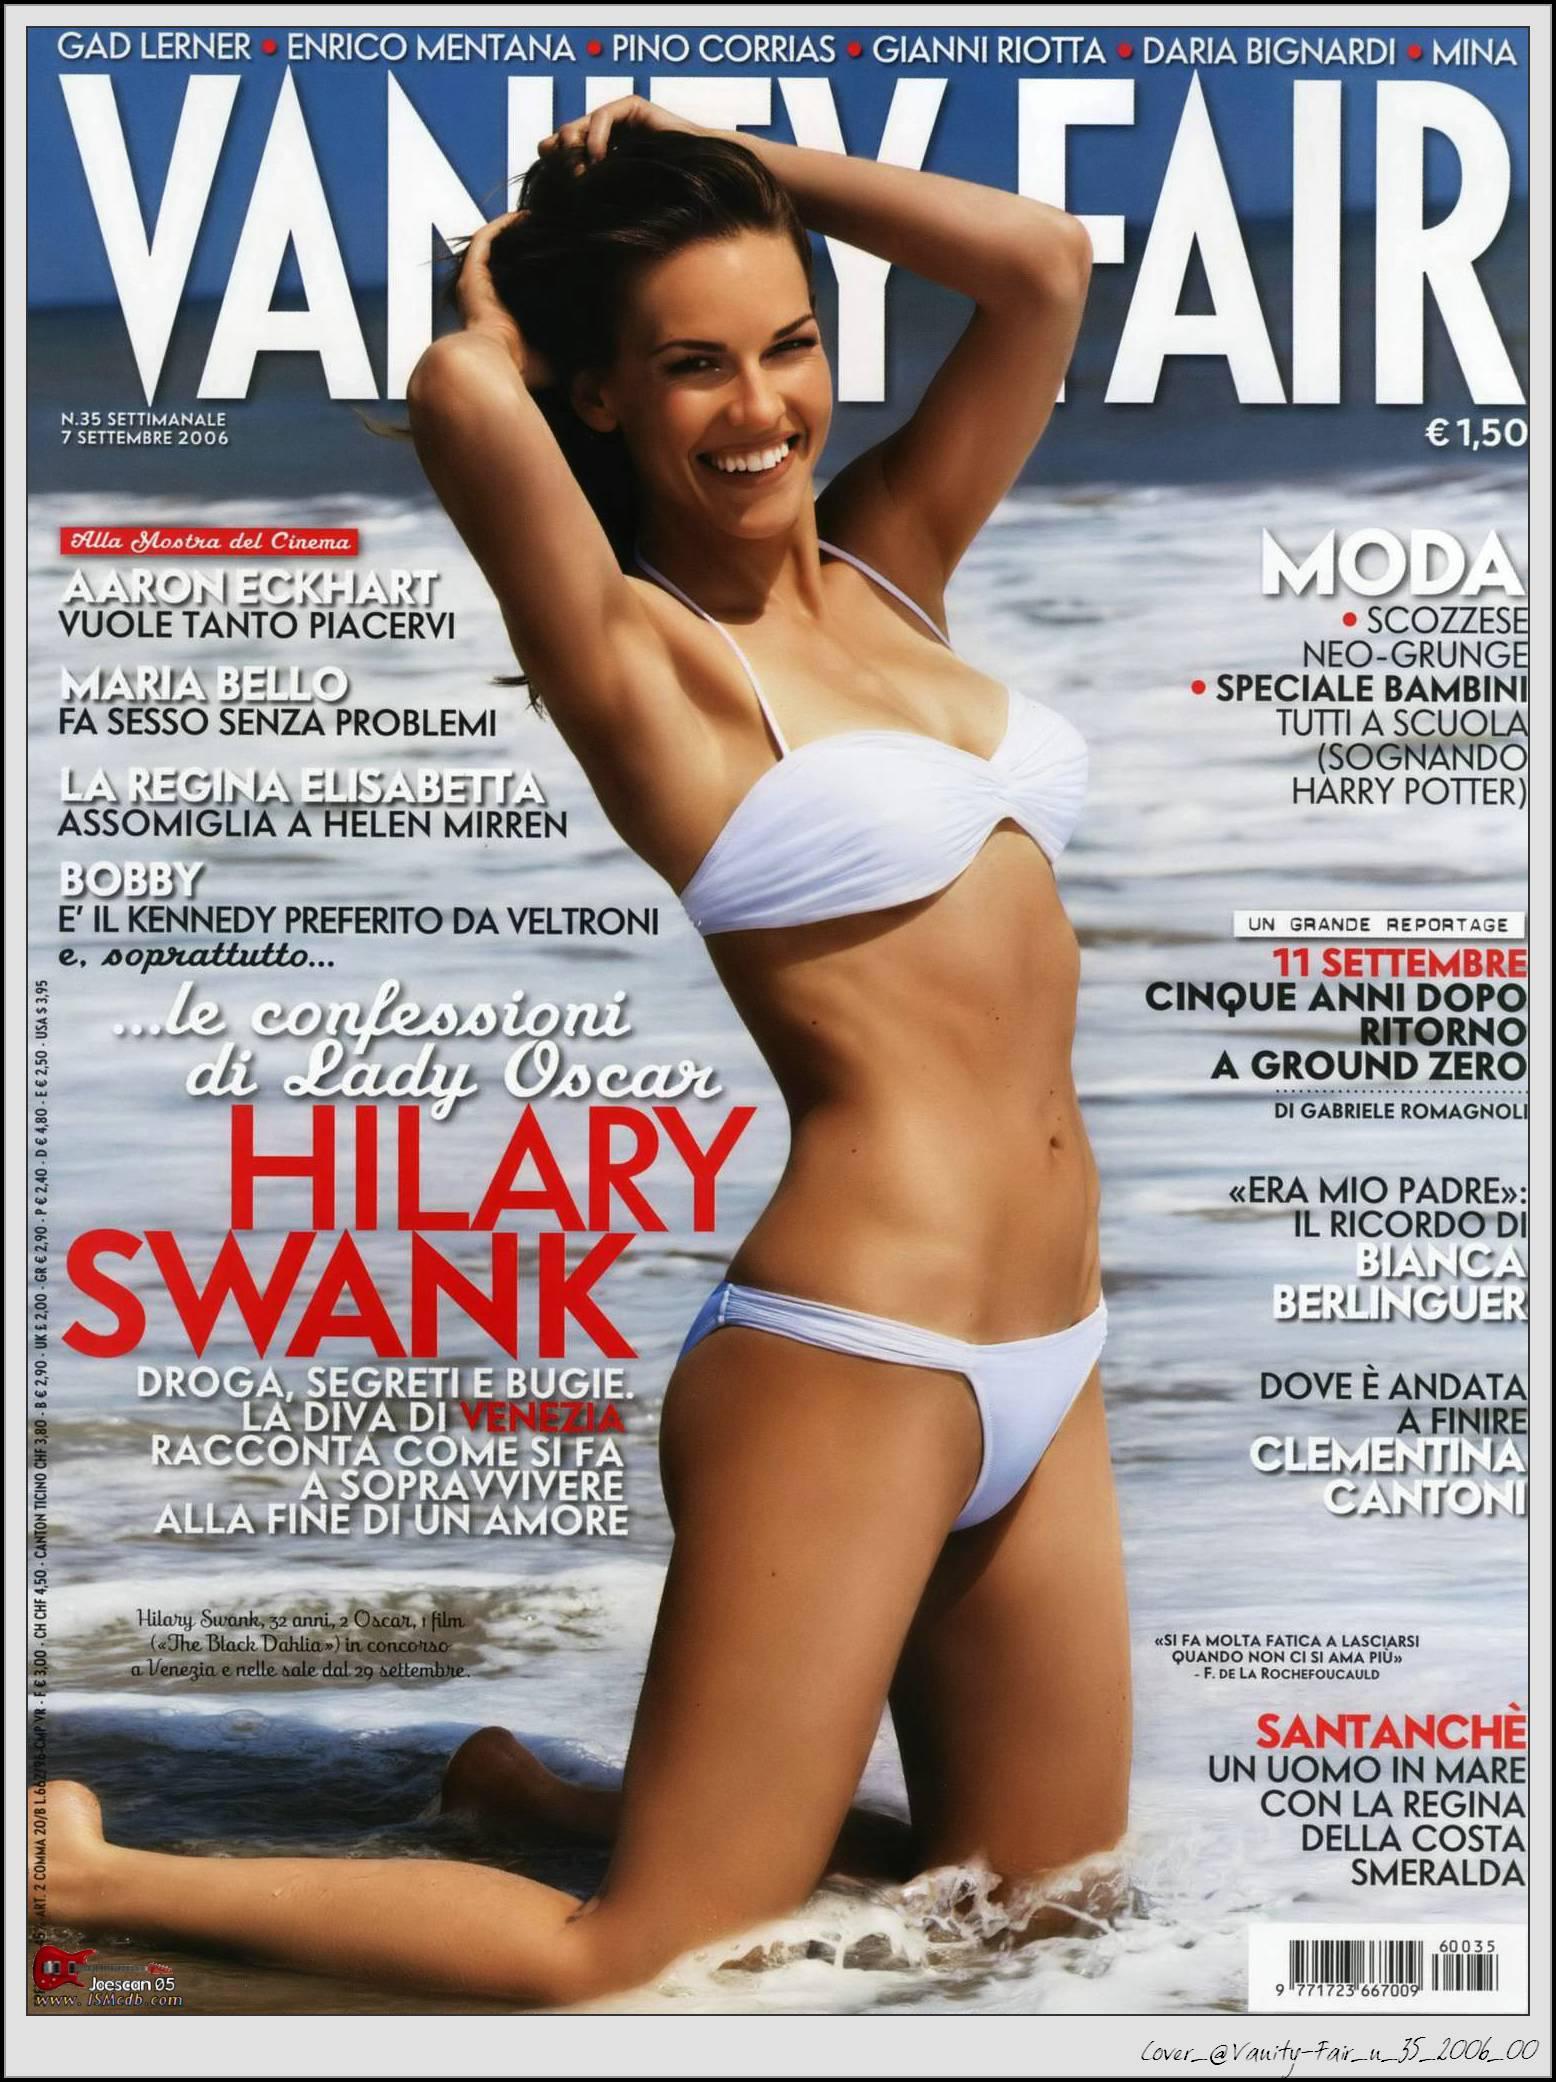 Hilary Swank coño 1